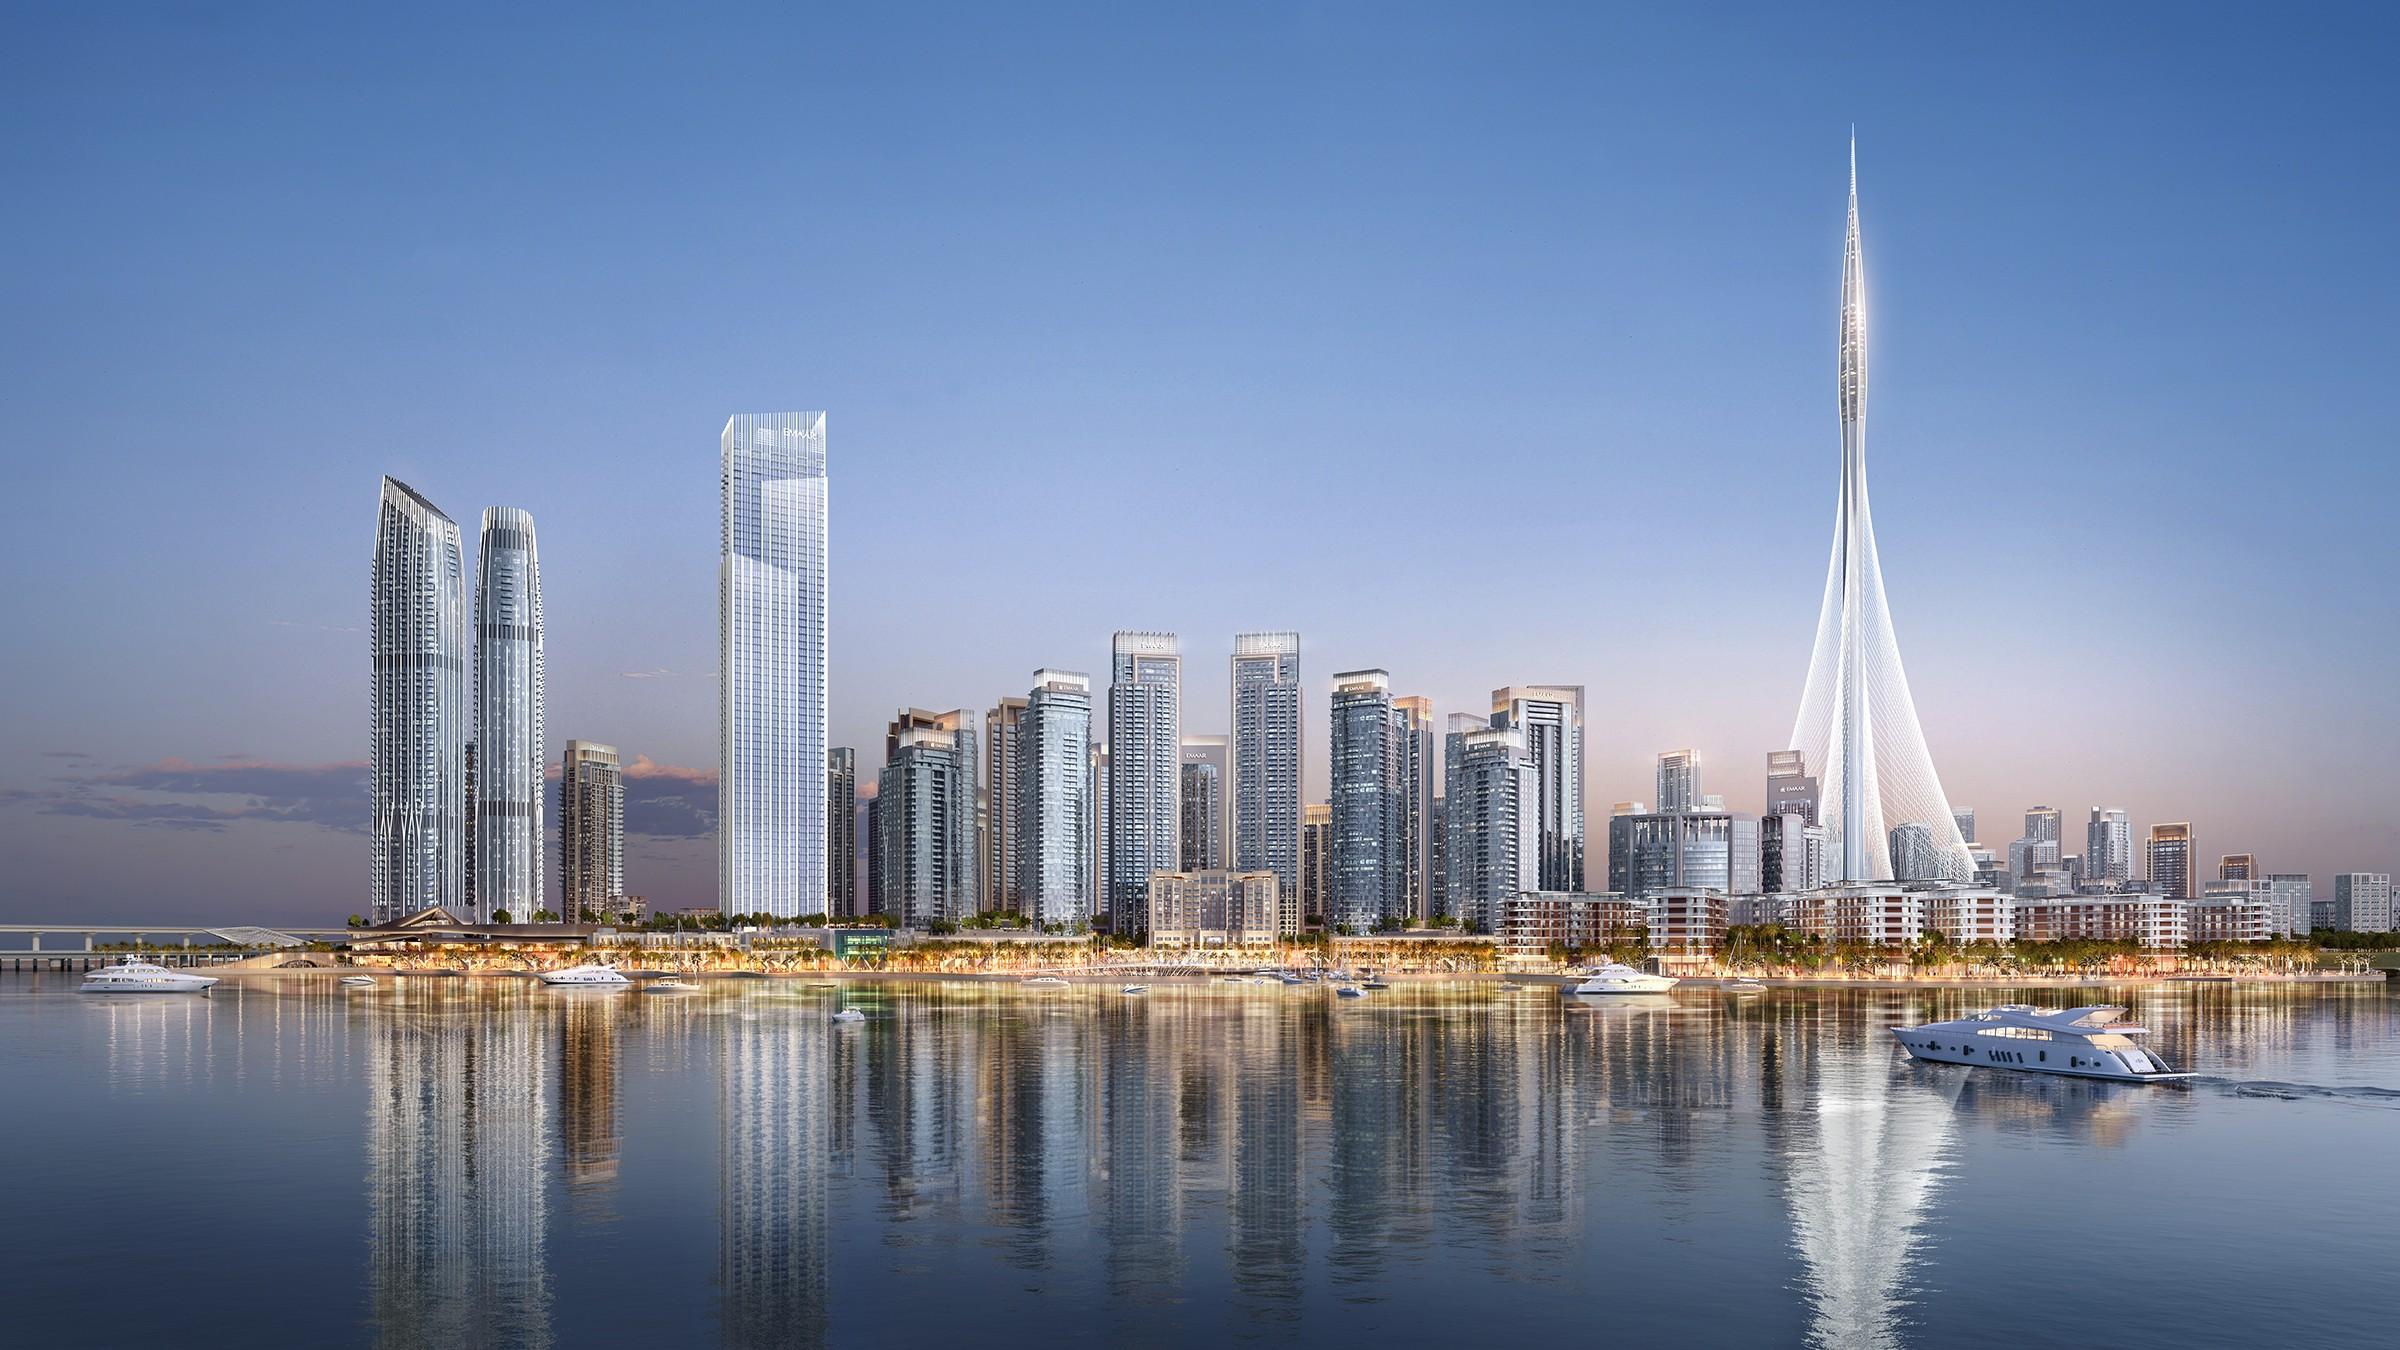 The grand Dubai creek harbour